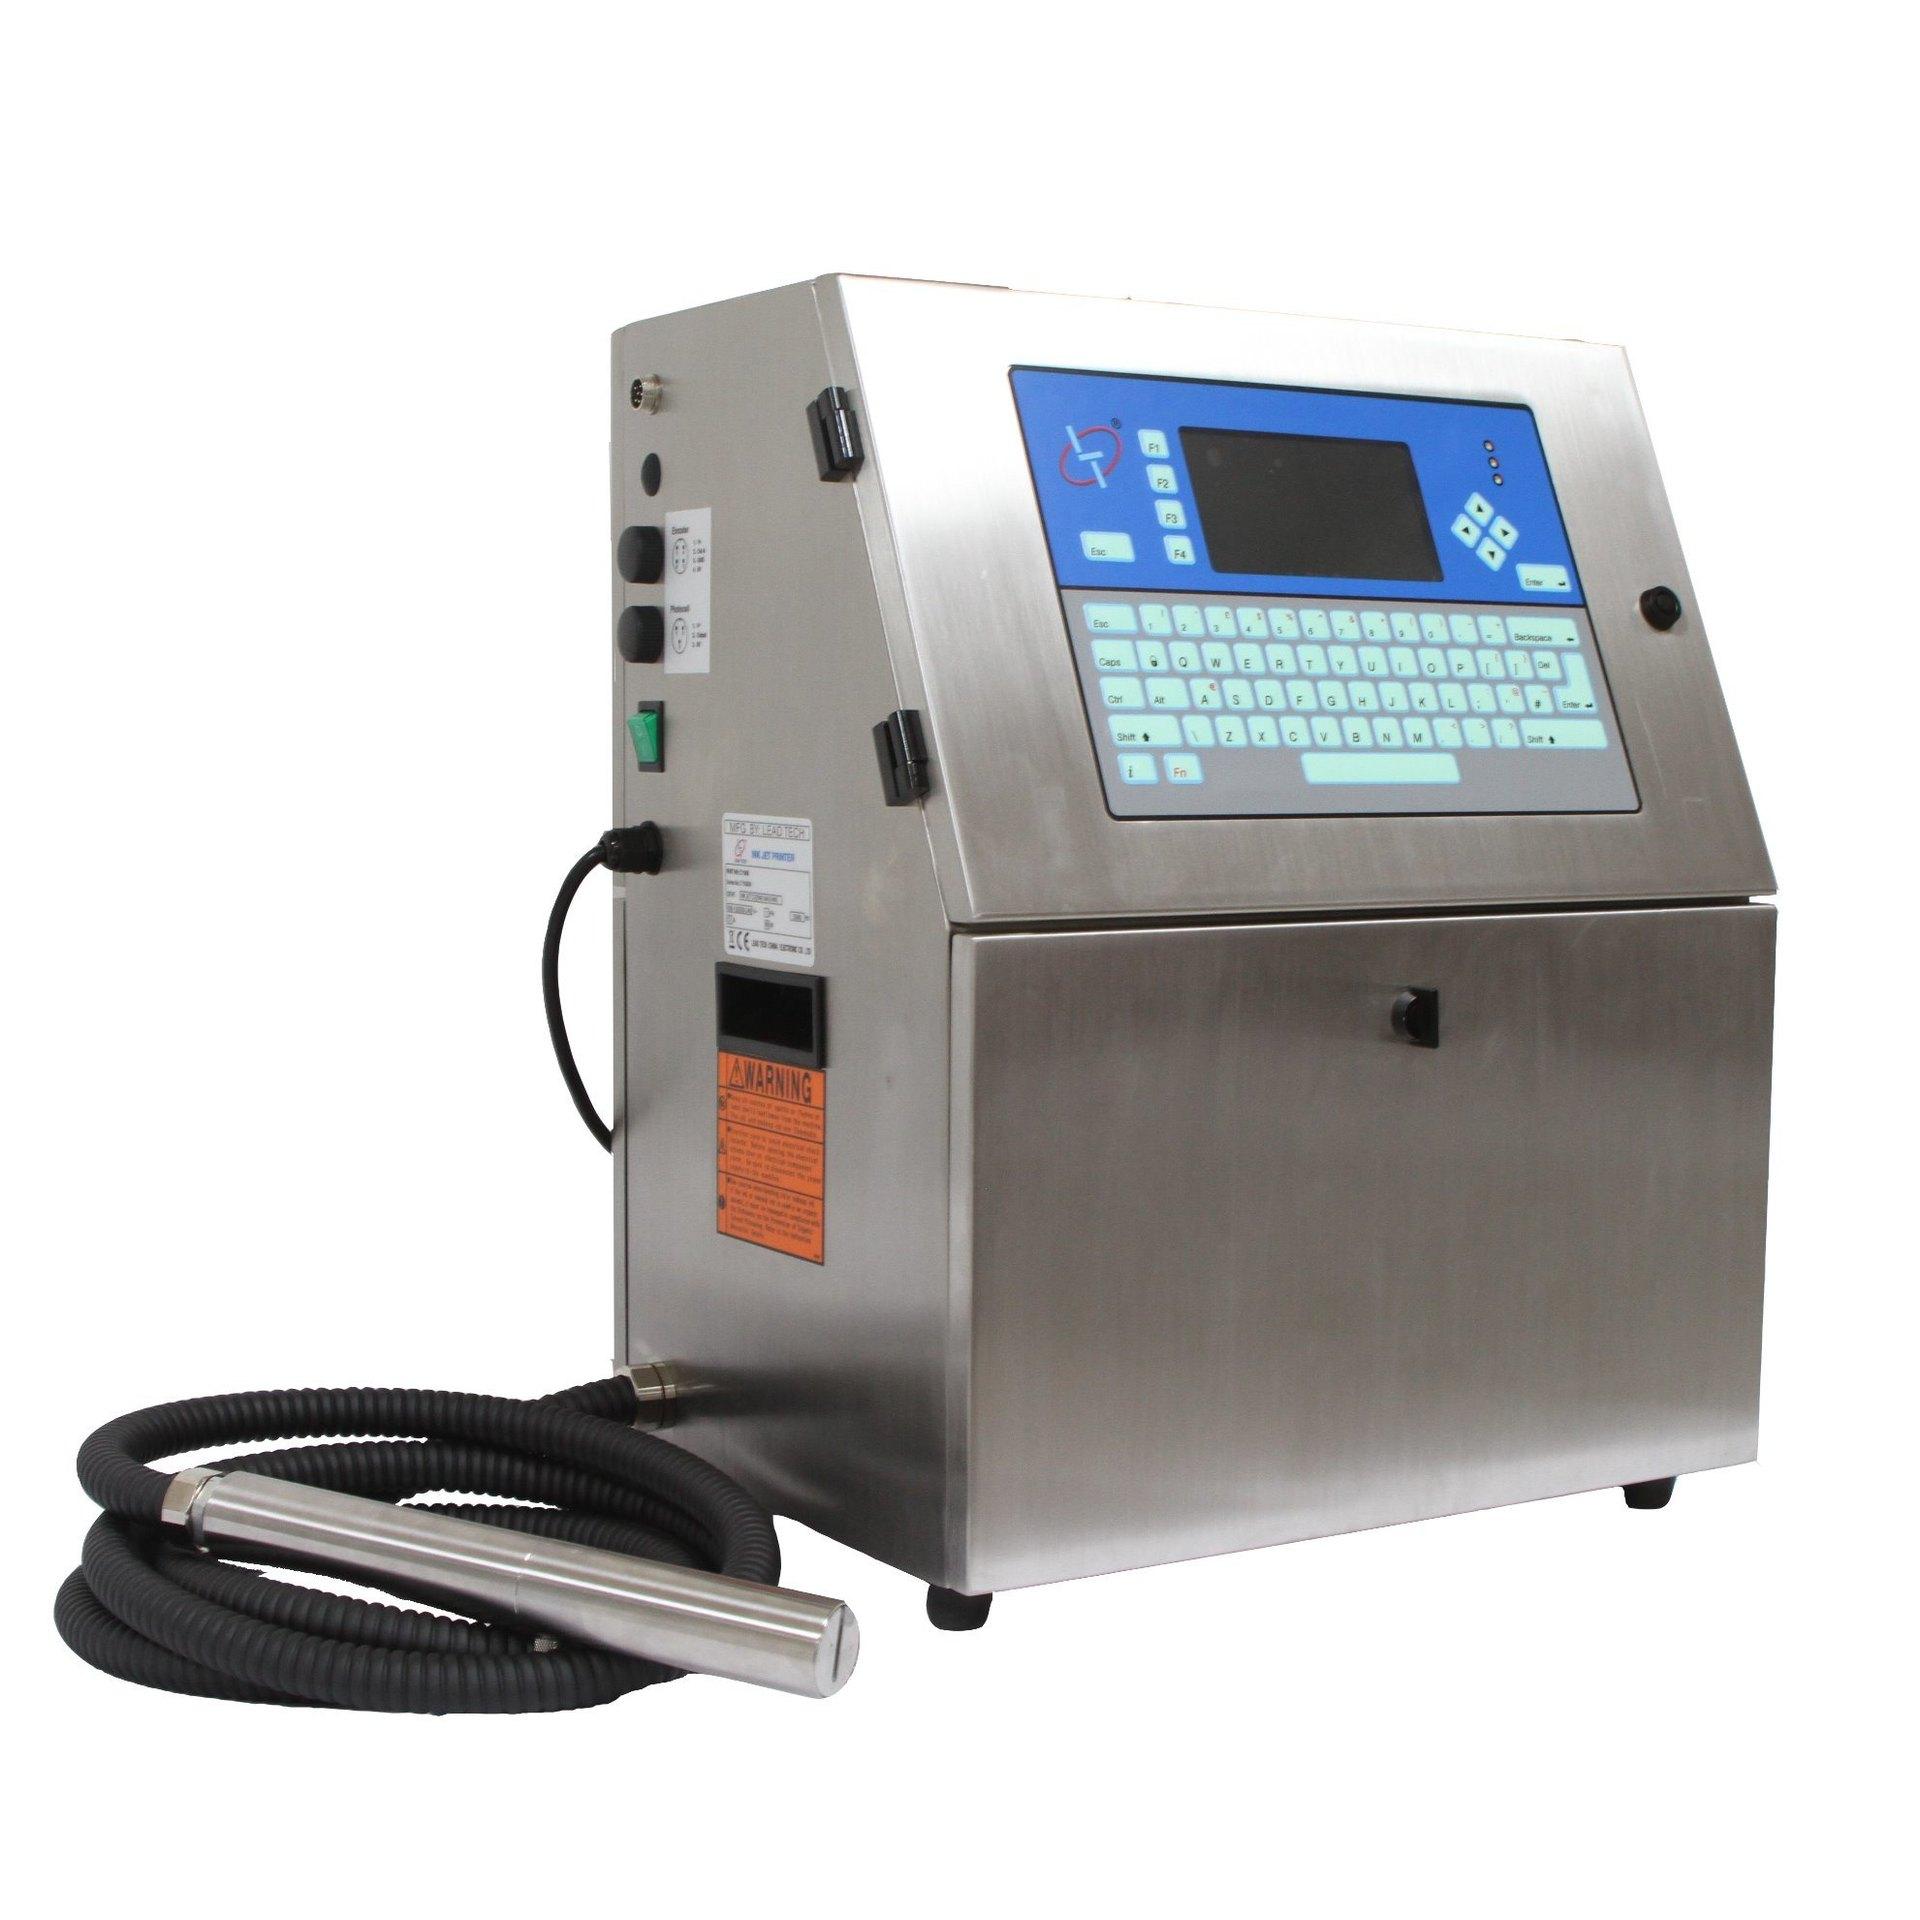 Lead Tech Lt1000s+ Reverse Printing Cij Inkjet Printer